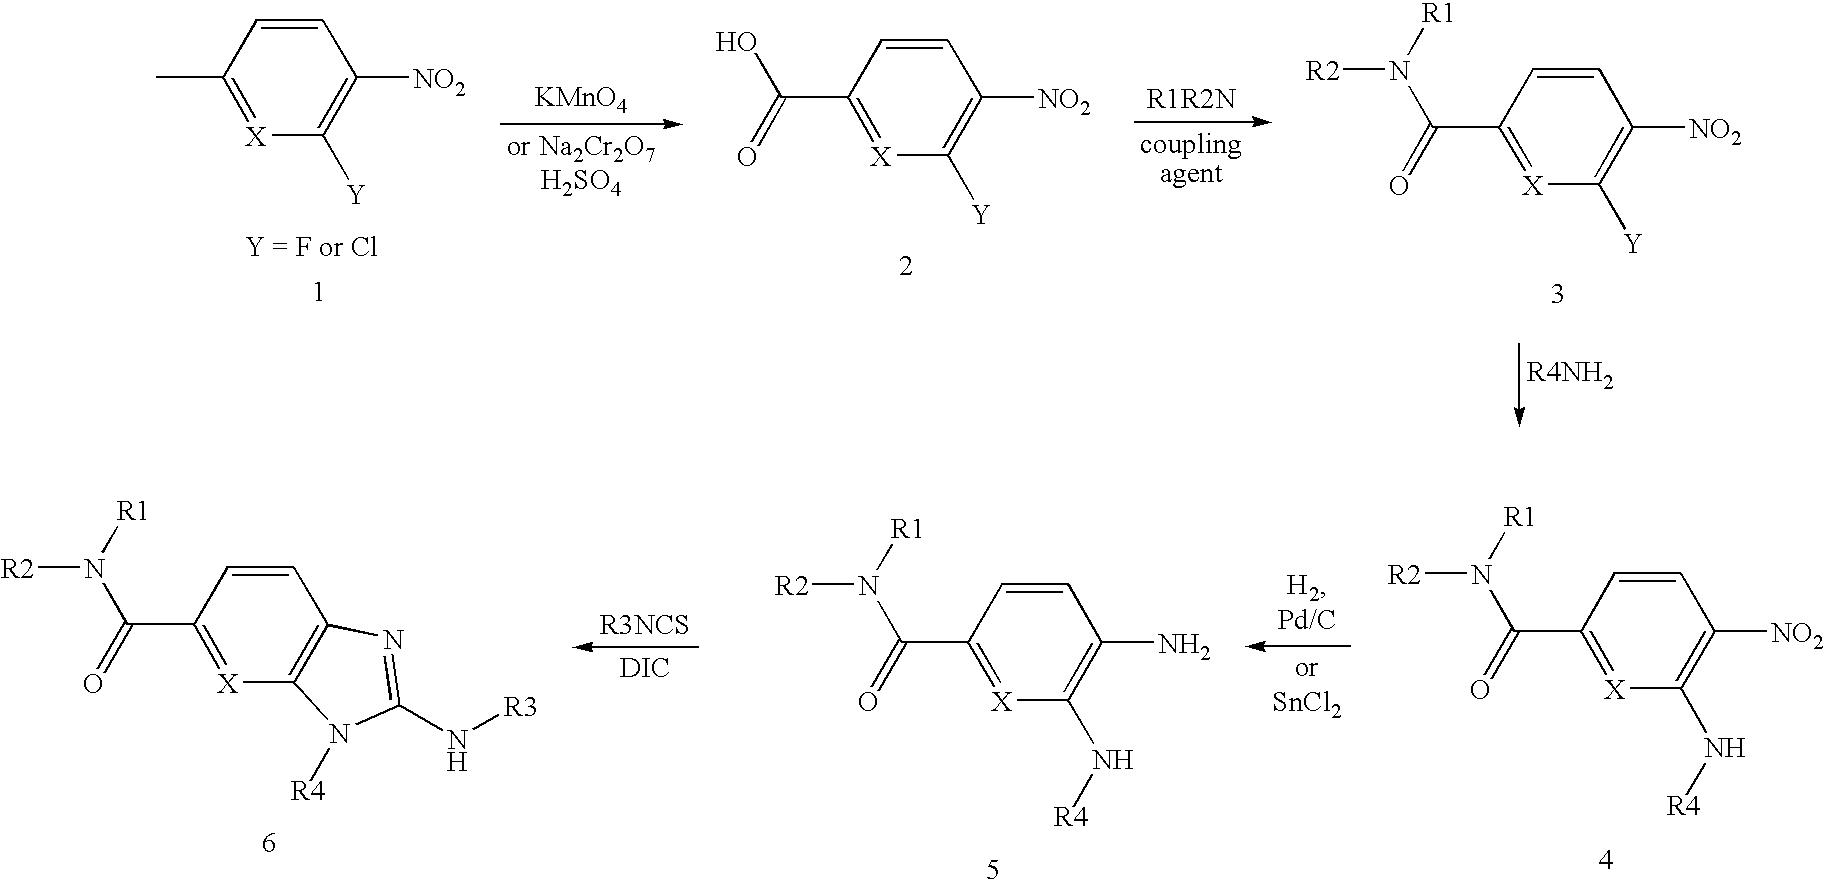 US20090270372A1 - Novel derivatives of benzimidazole and imidazo